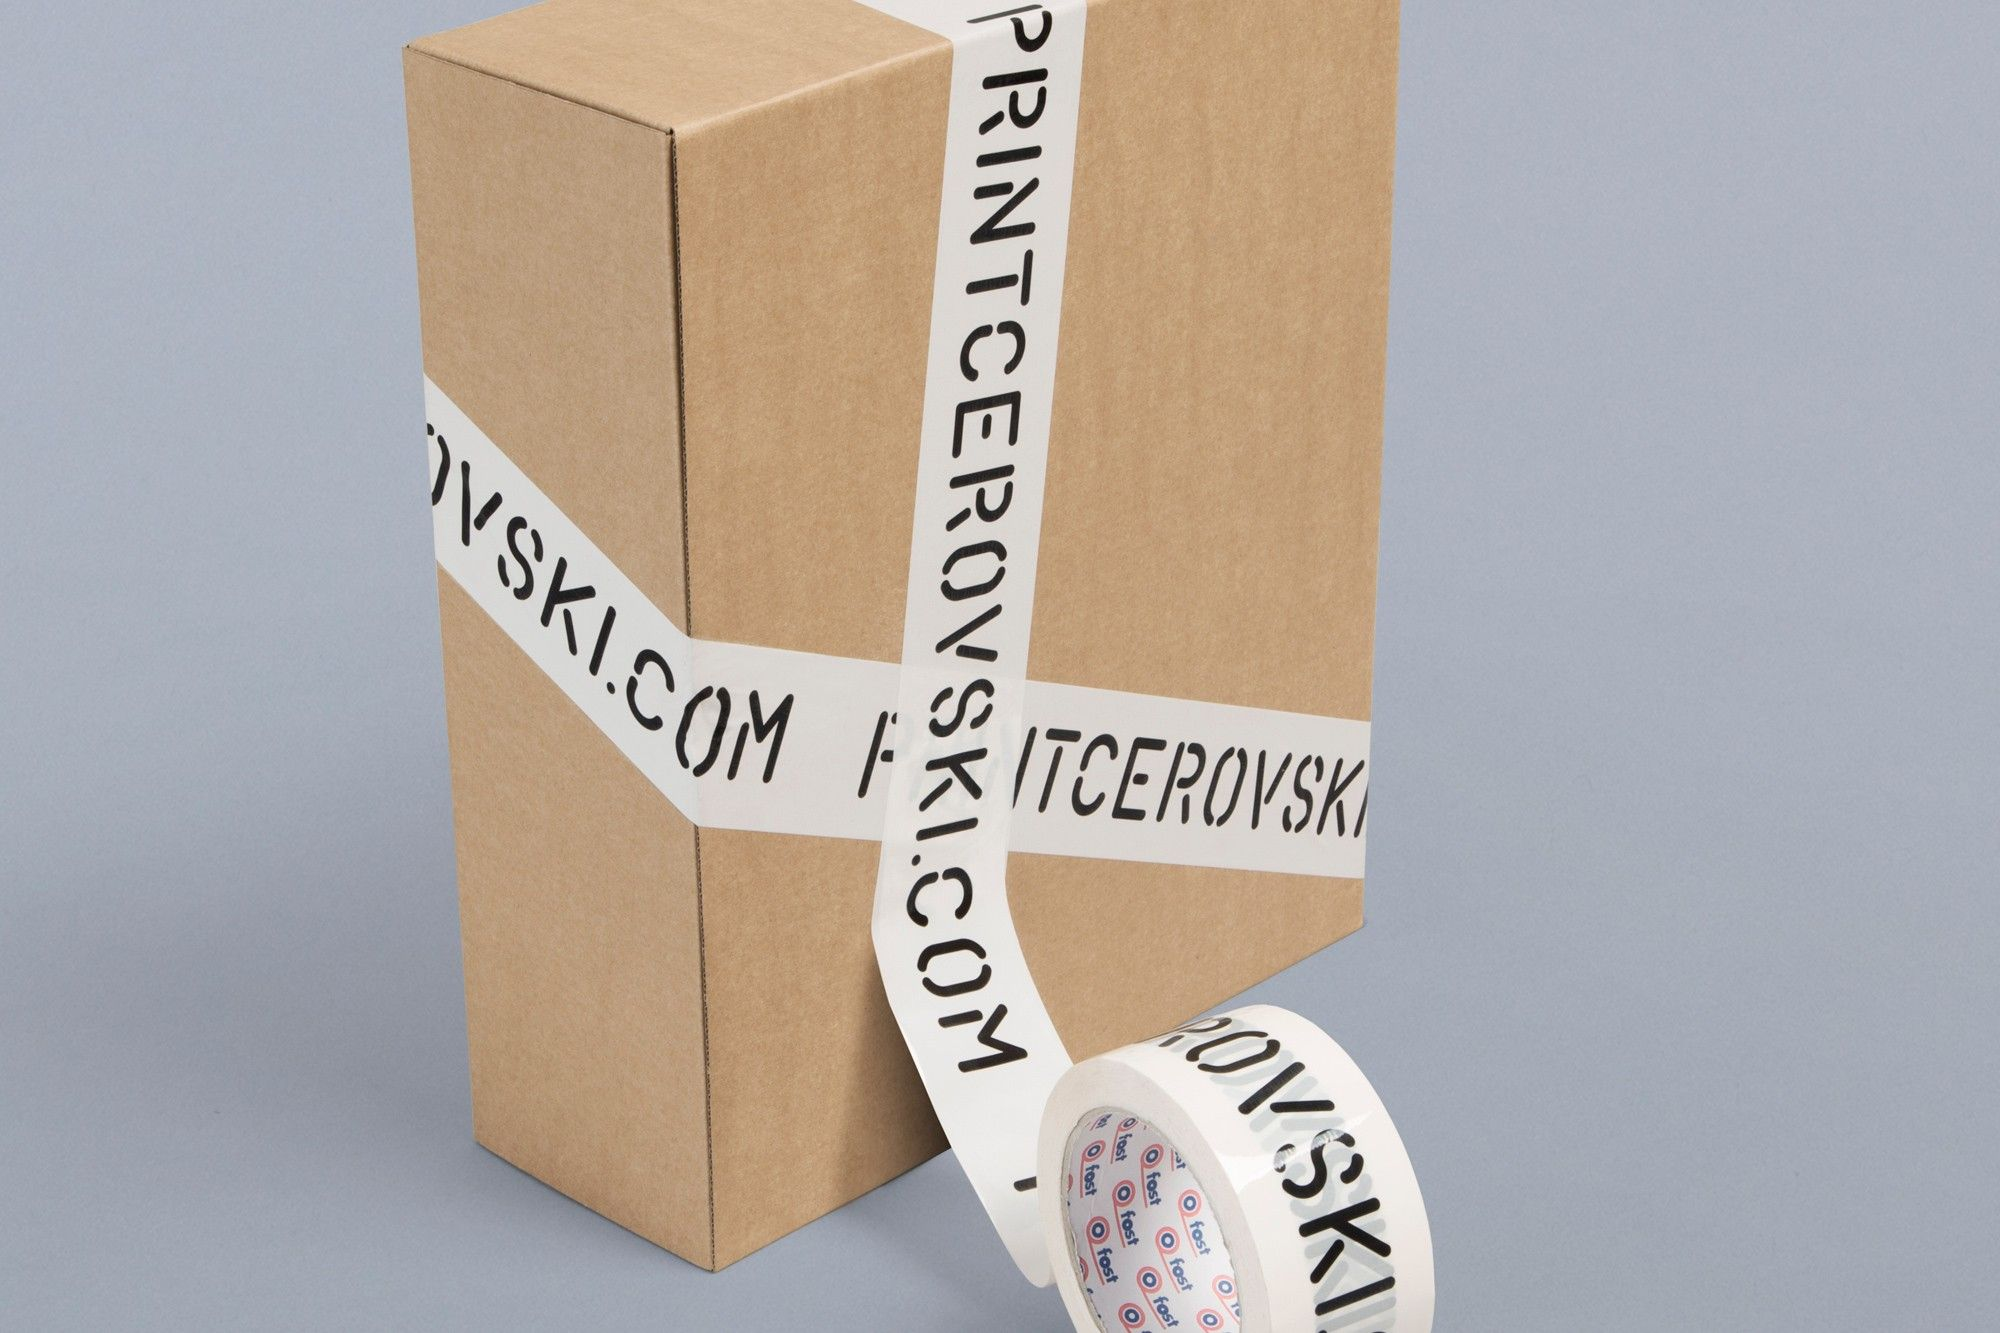 Cerovski Bunch Jewelry Packaging Design Box Packaging Design Design Tape